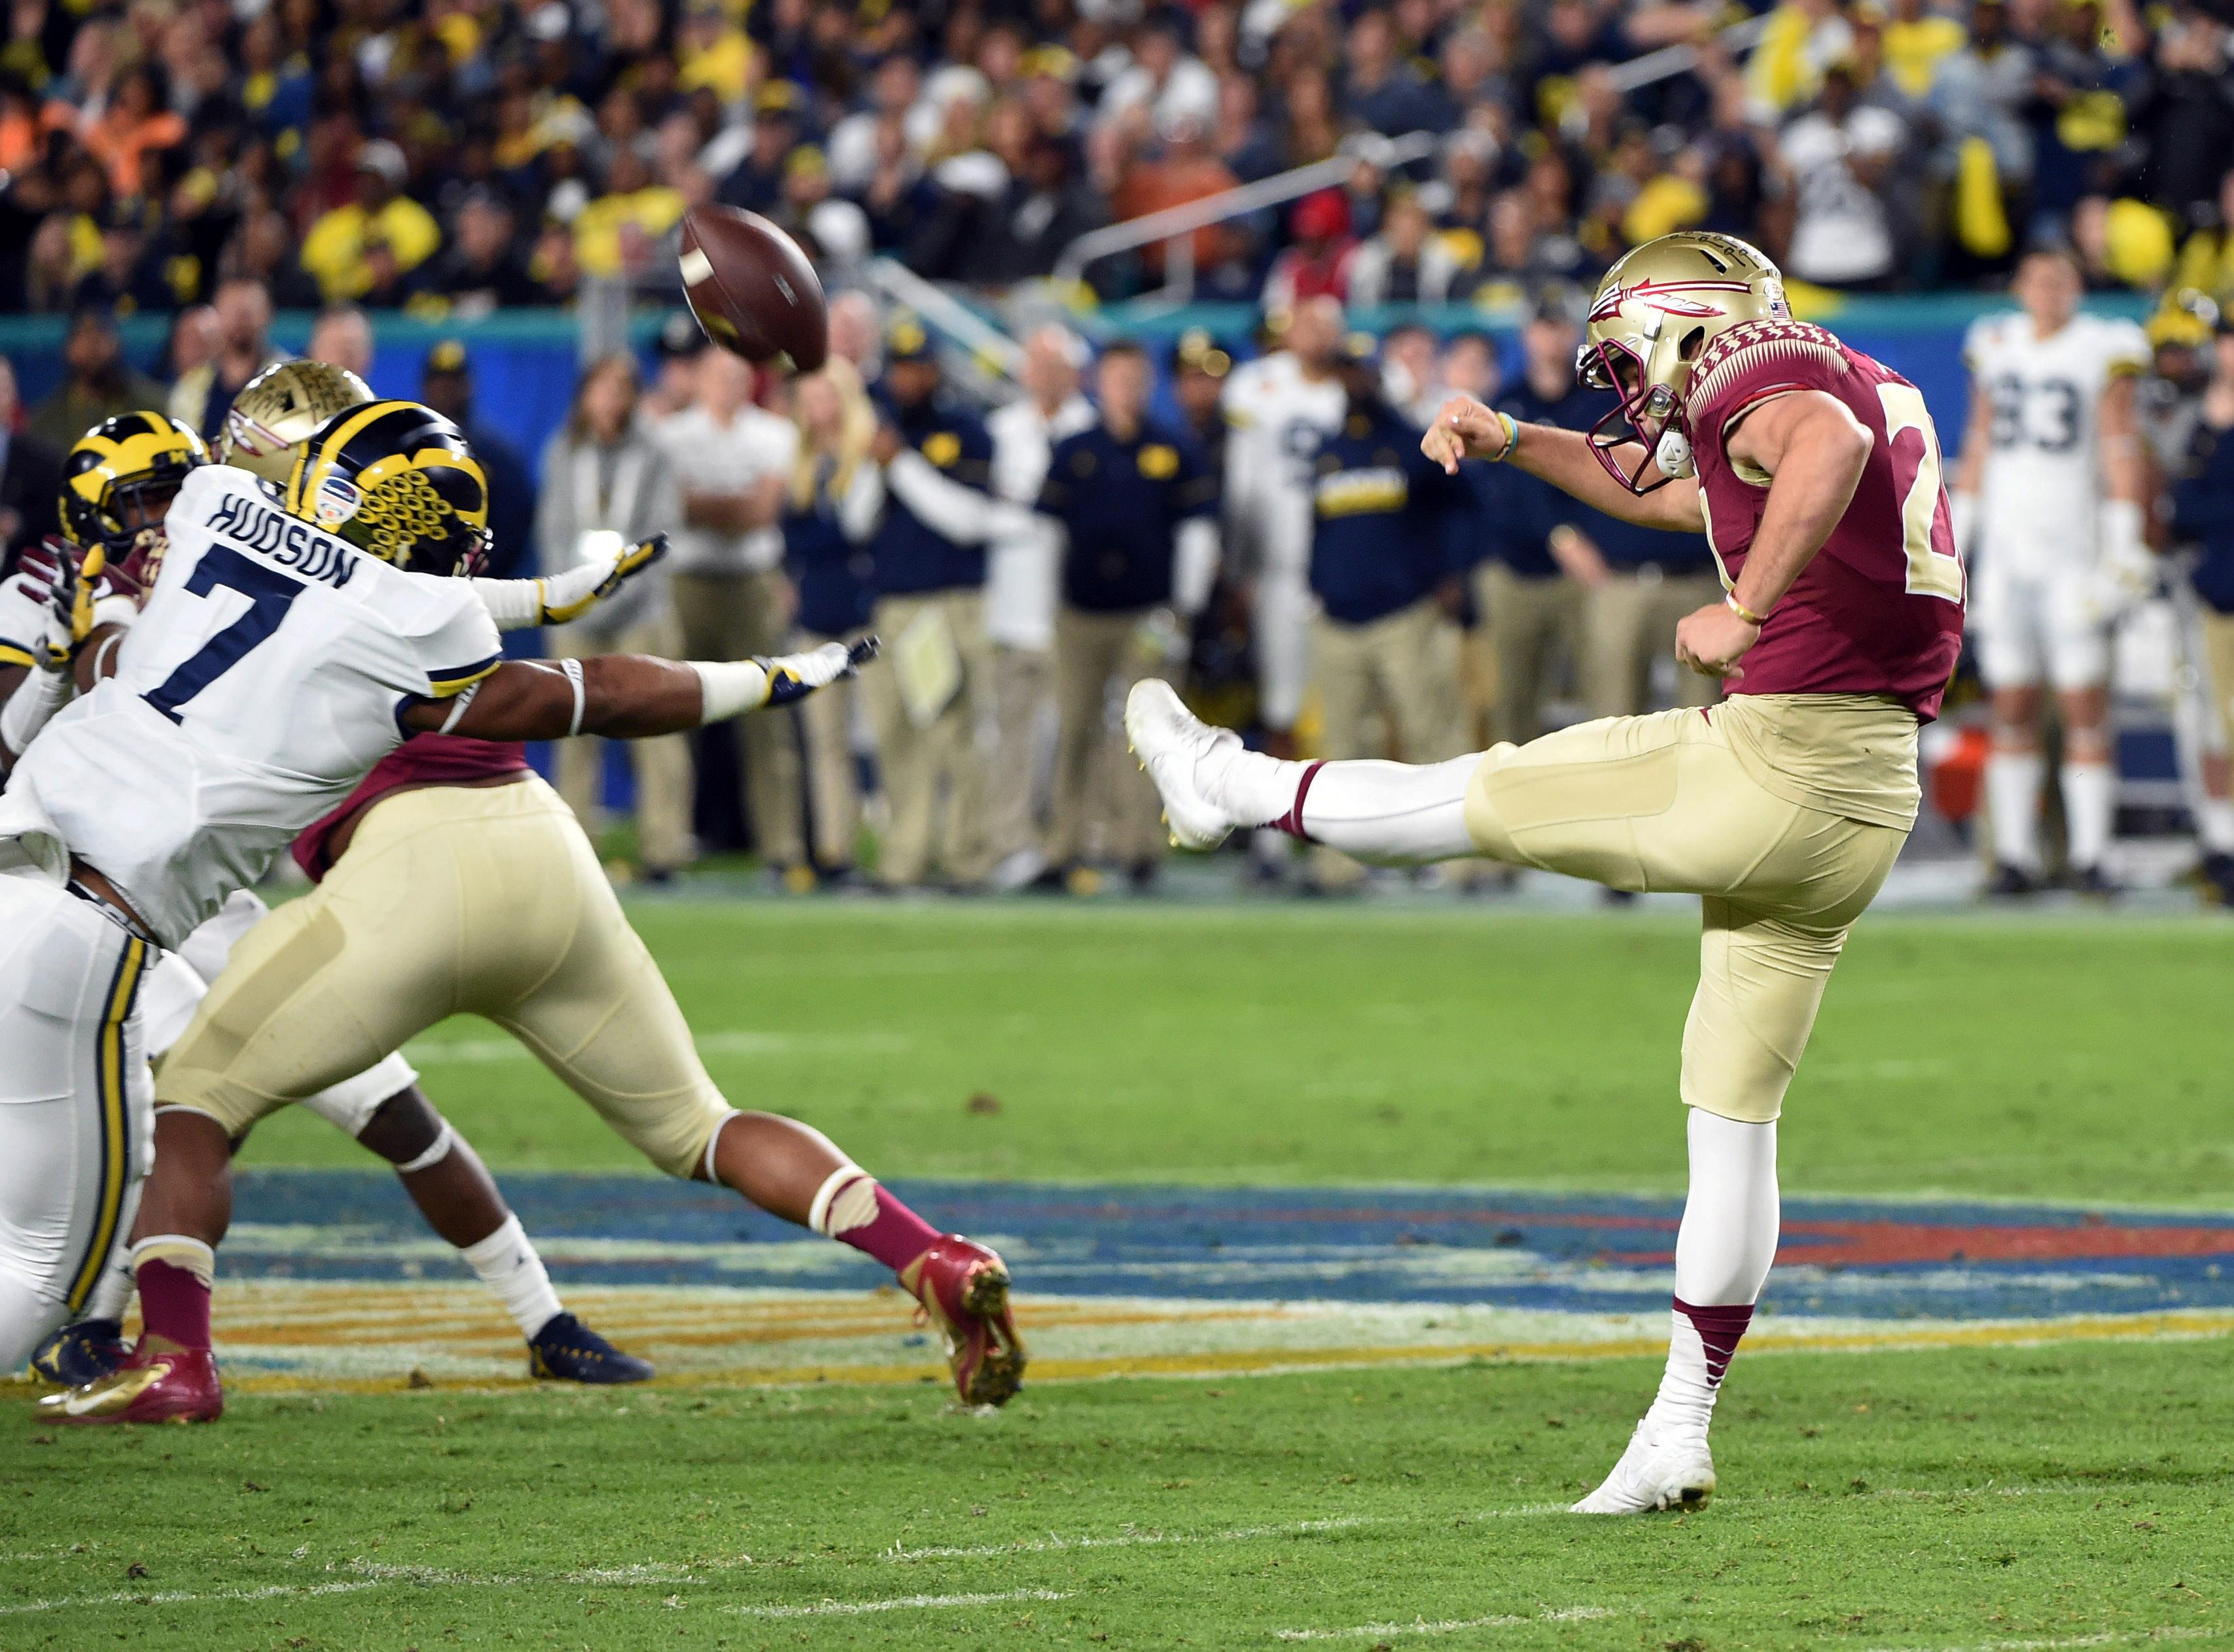 Dec 30 2016 Miami Gardens Fl Usa Michigan Wolverines Safety Khaleke Hudson 7 Attempts To Block A Punt From Florida State Seminoles Place Kicker Logan